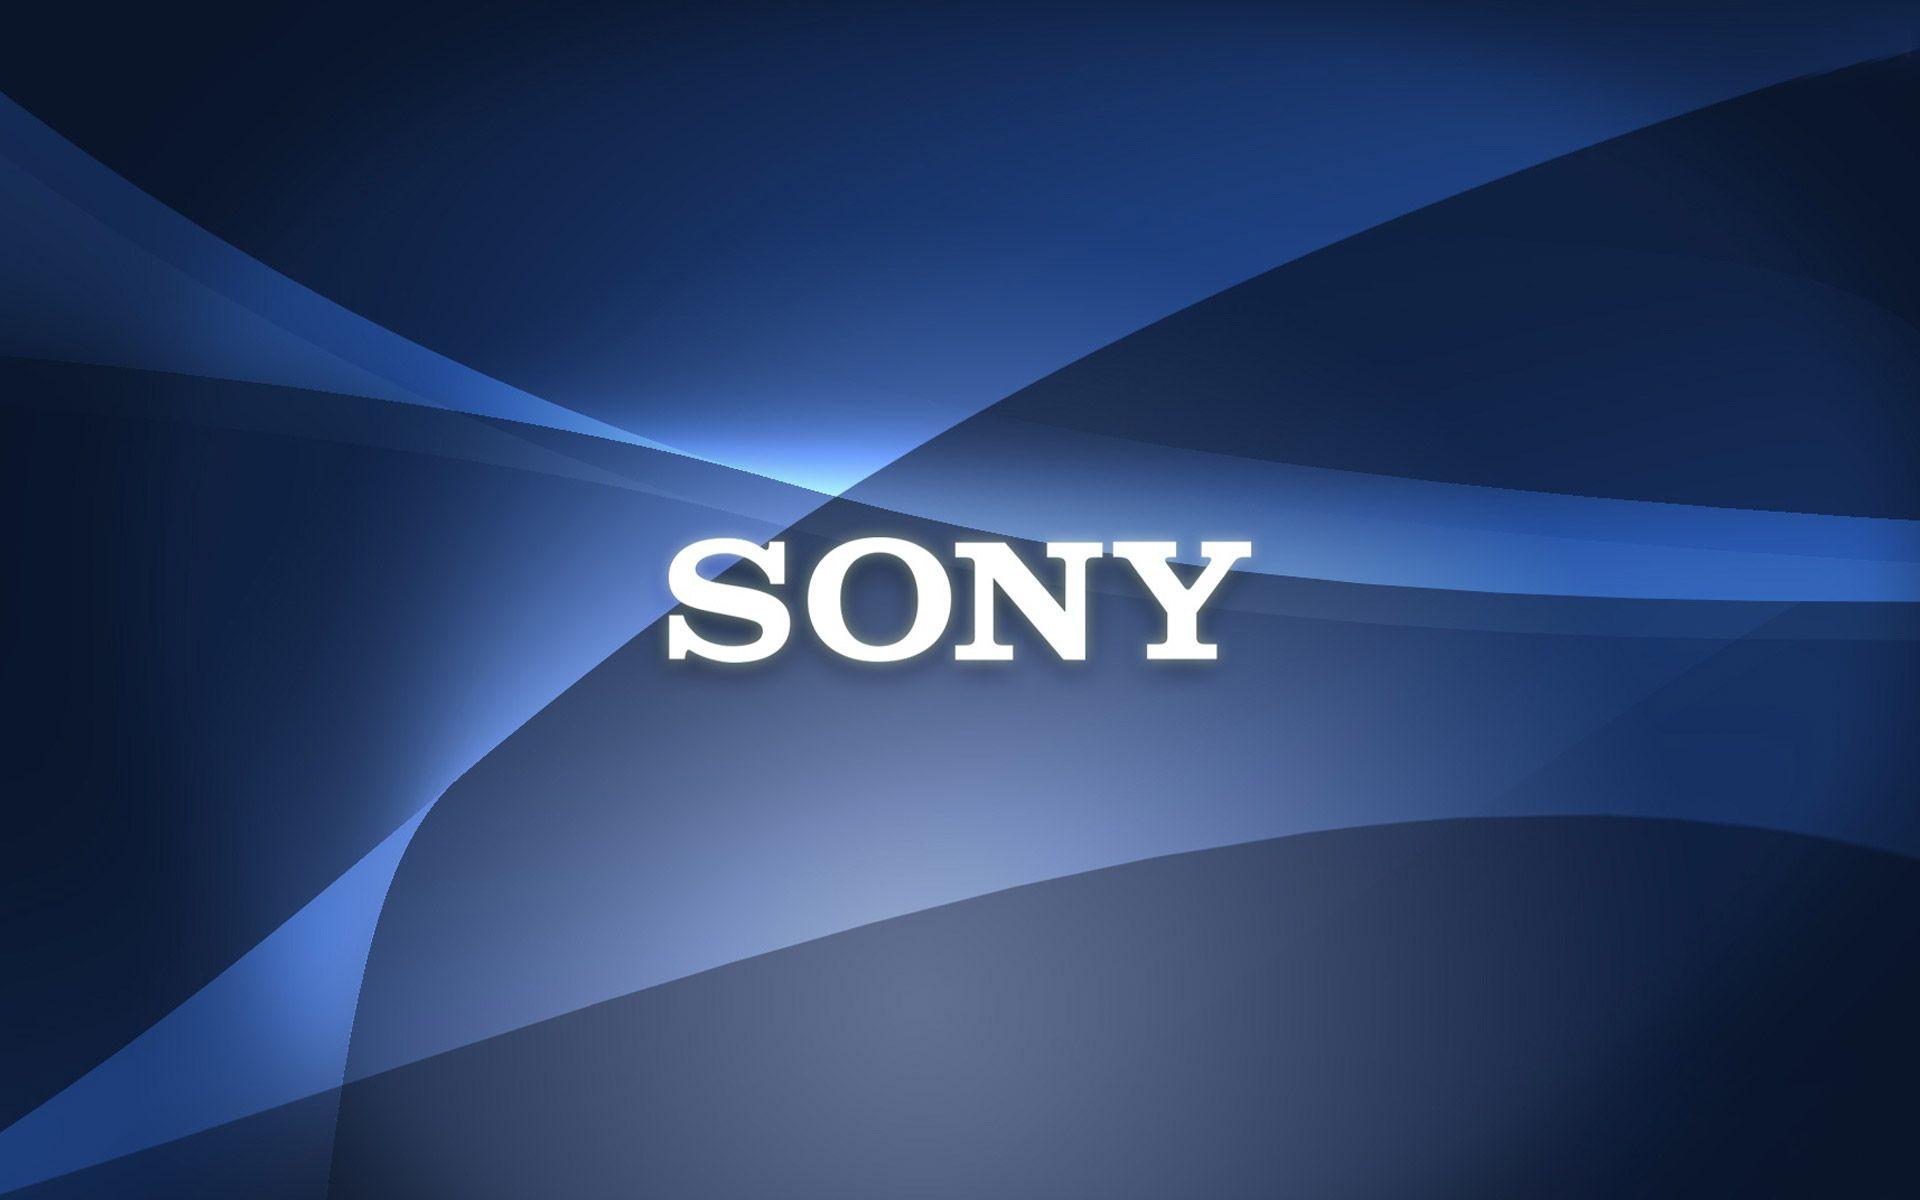 Sony Playstation Logo Wallpaper In 2019 Logo Wallpaper Hd